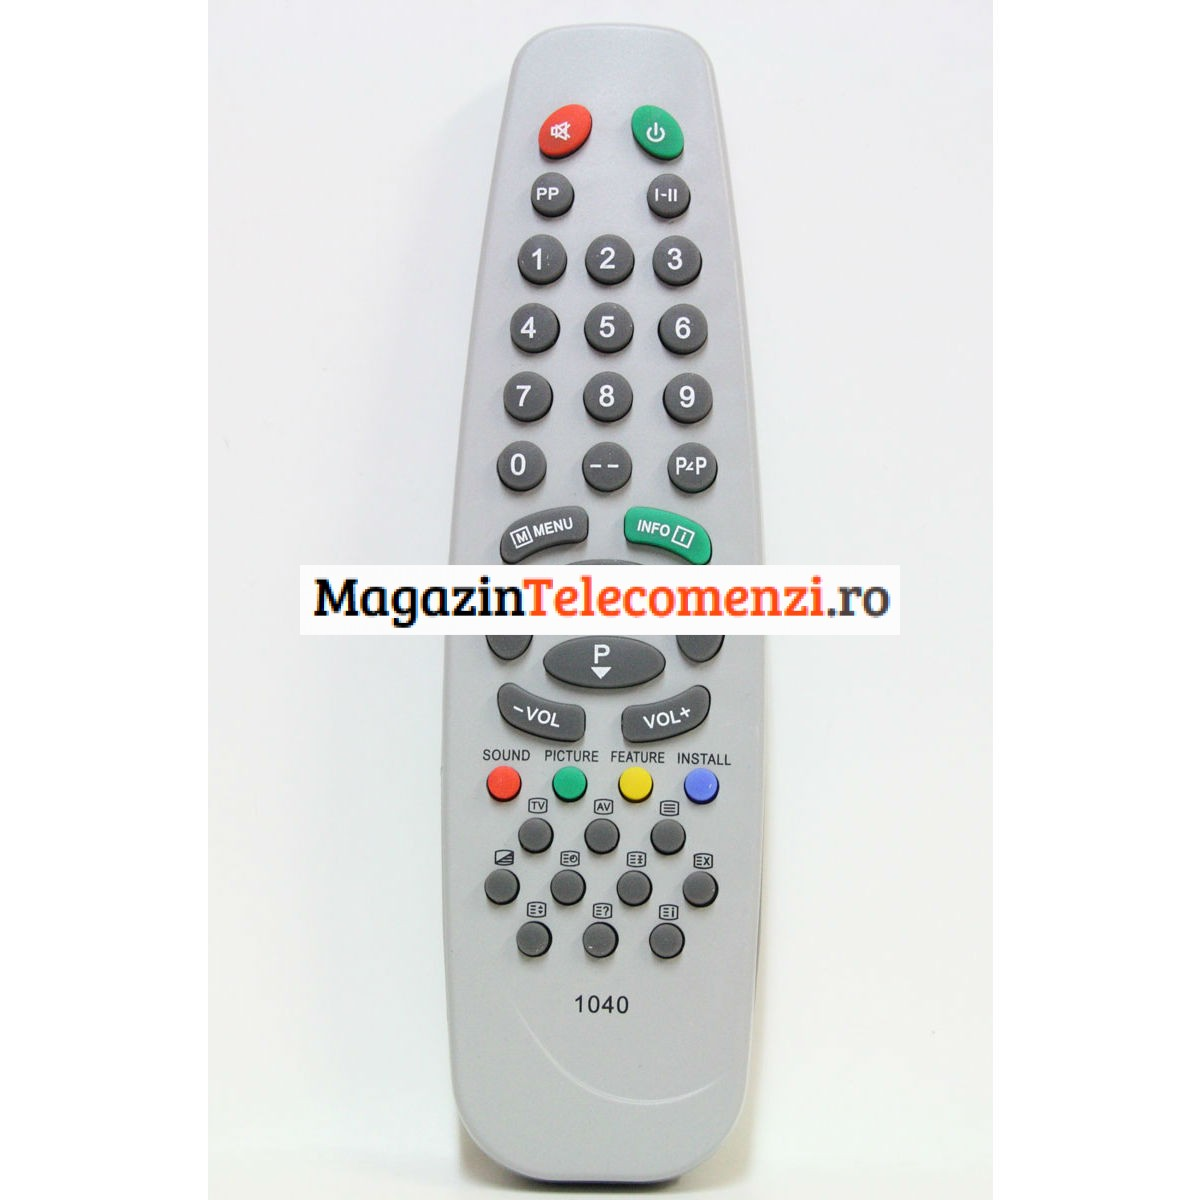 Telecomanda EUROCOLOR VESTEL 1040